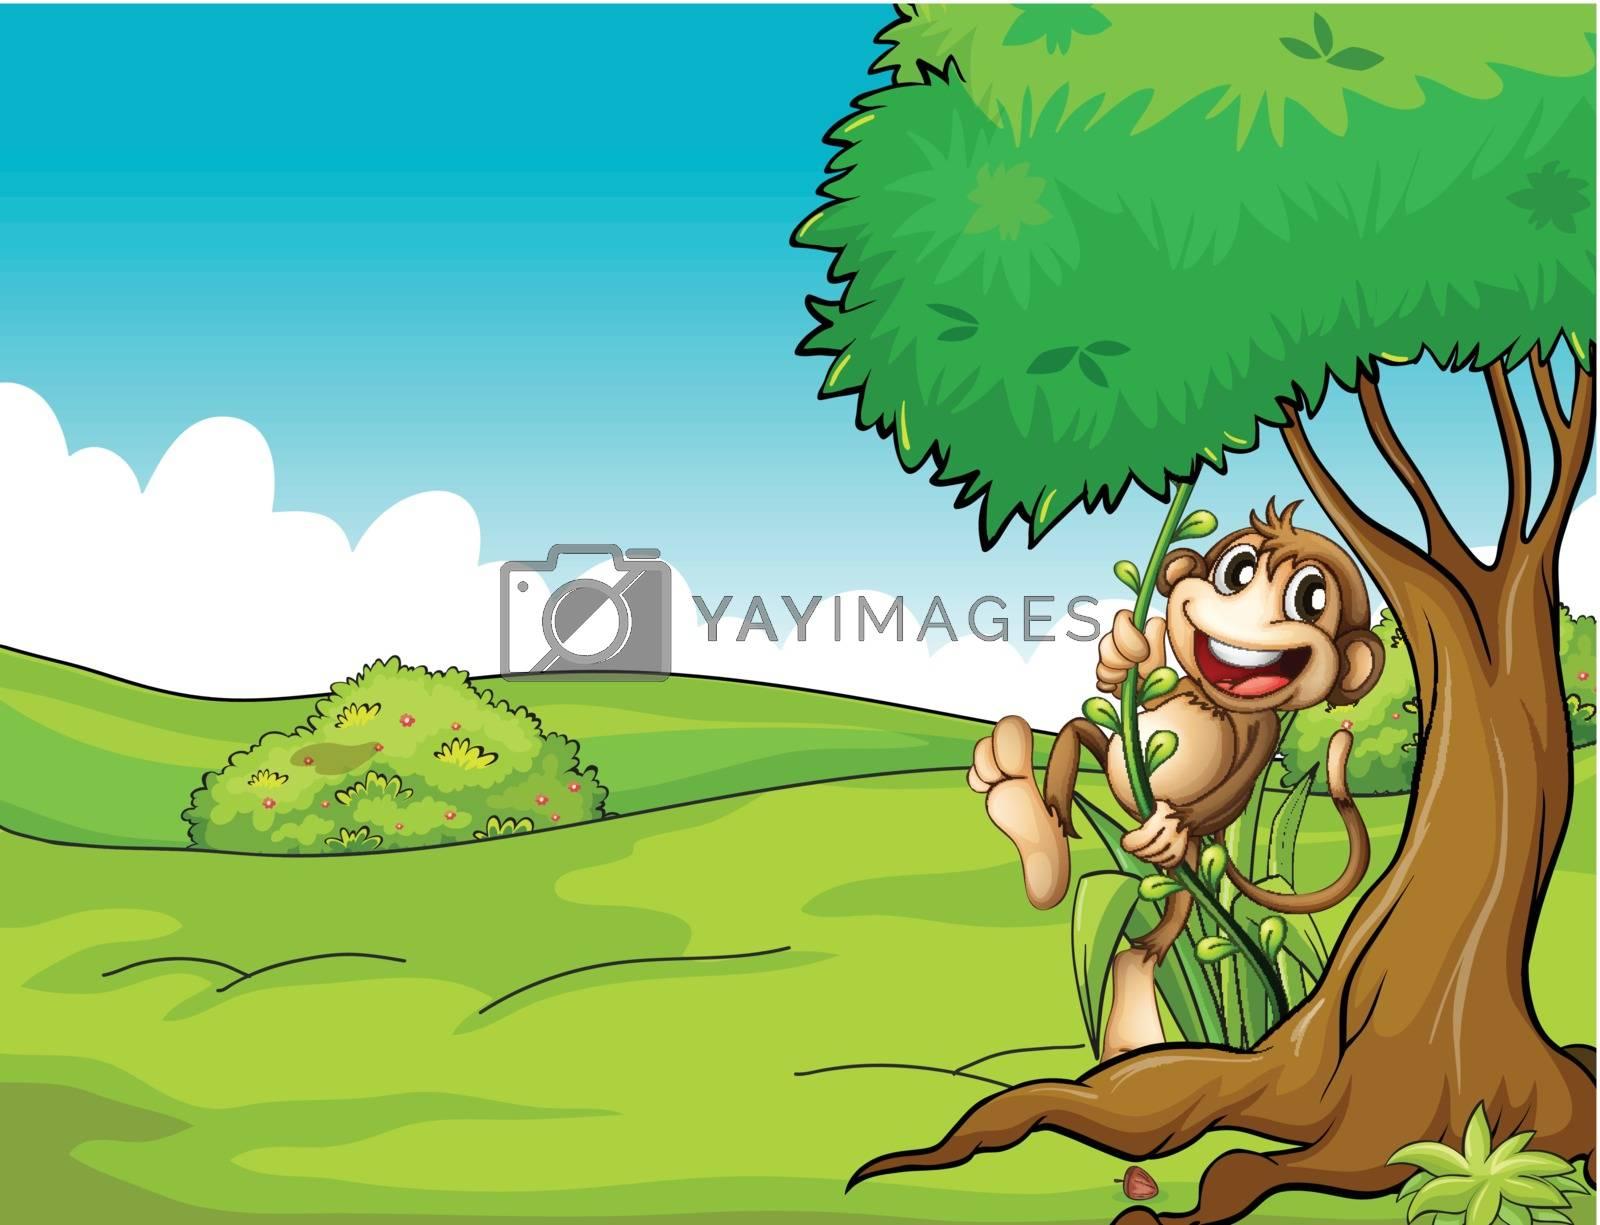 Illustration of a very happy monkey